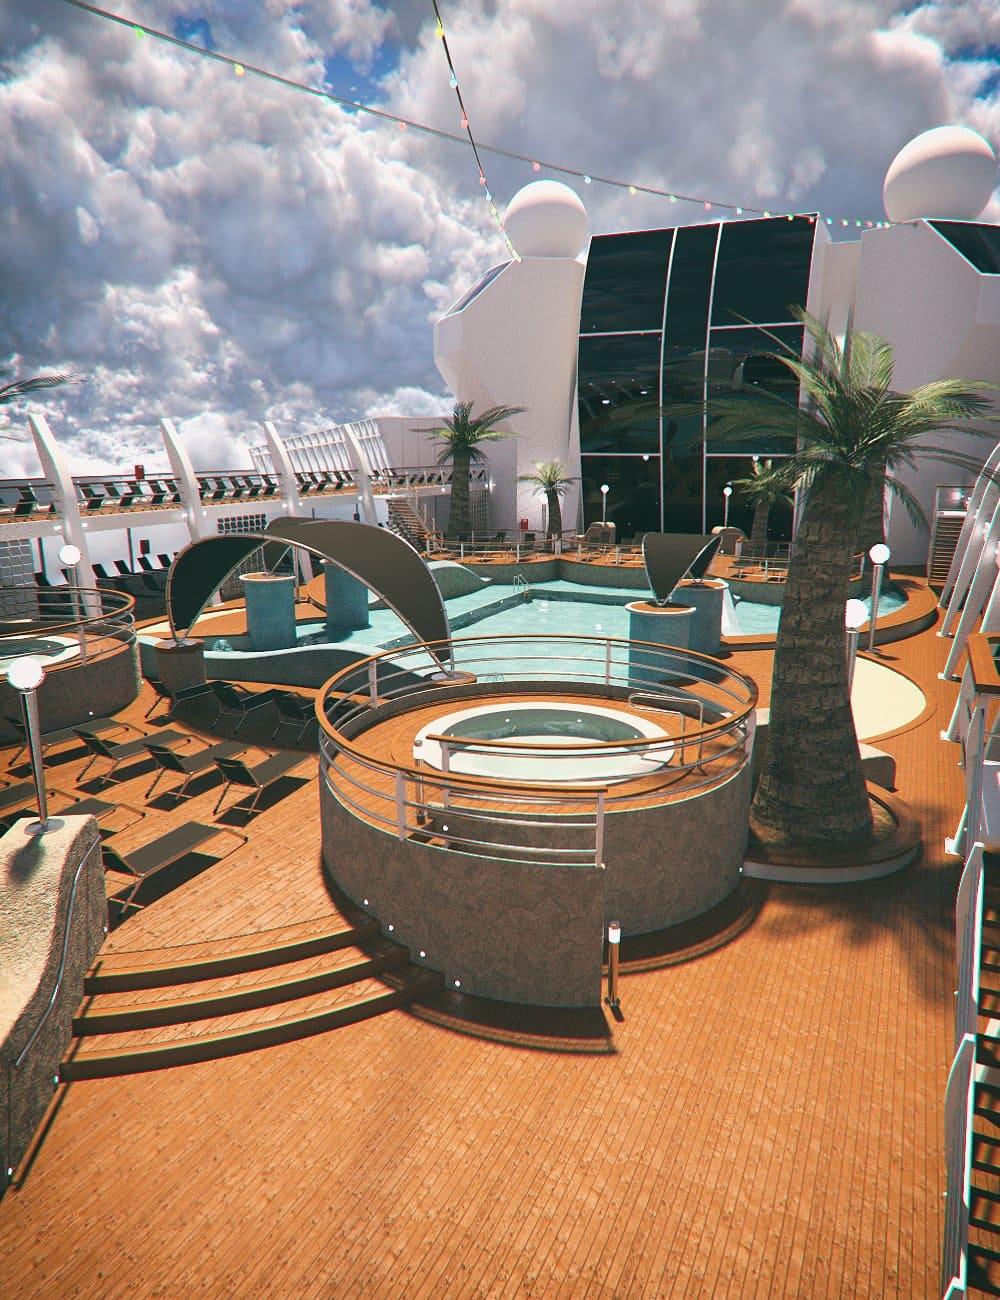 Cruise Ship Pool Deck_DAZ3D下载站